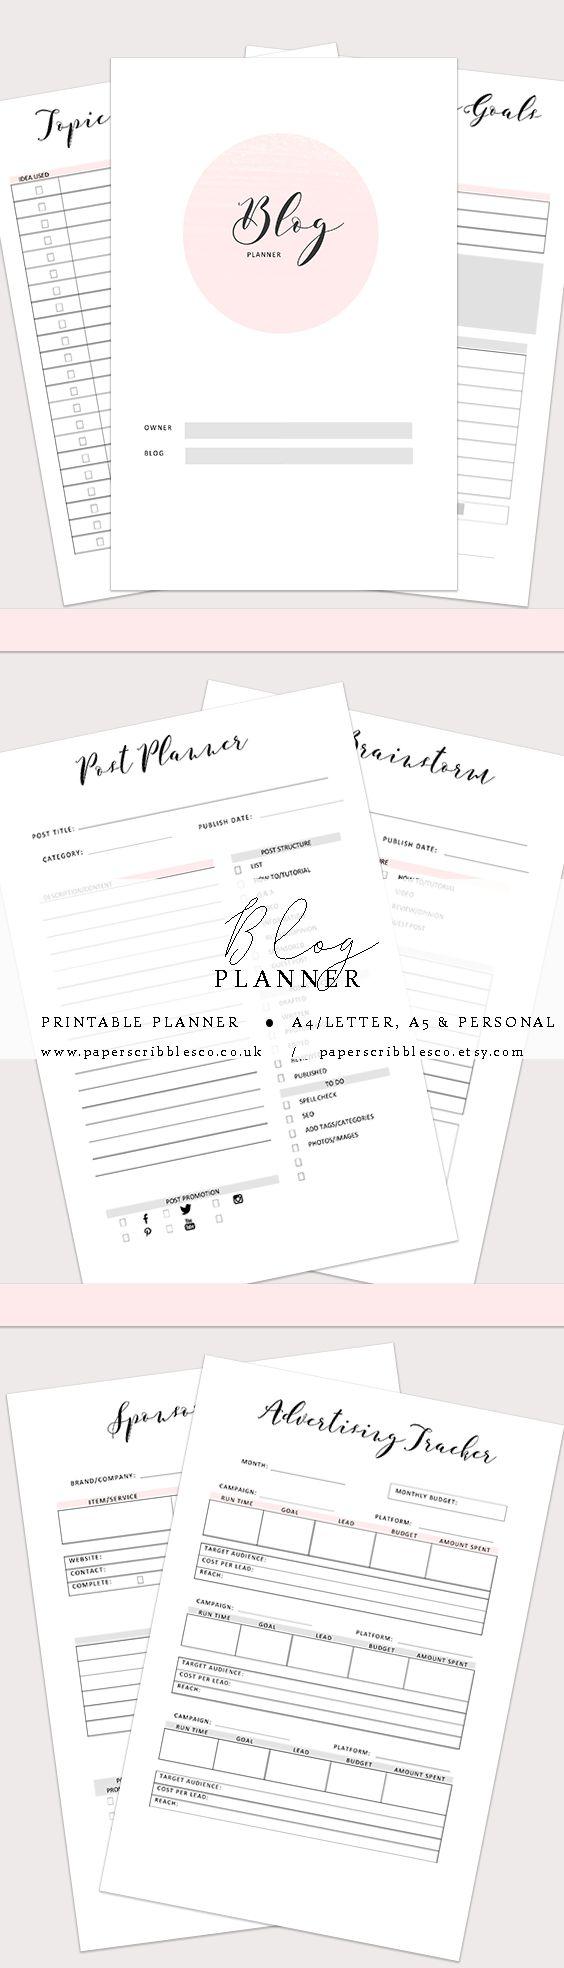 Blog Planner | Social Media Planner | Printable Planner Inserts | New Bloggers | Blog Business | Blog Organisation | Blog Binder | Planner Inserts